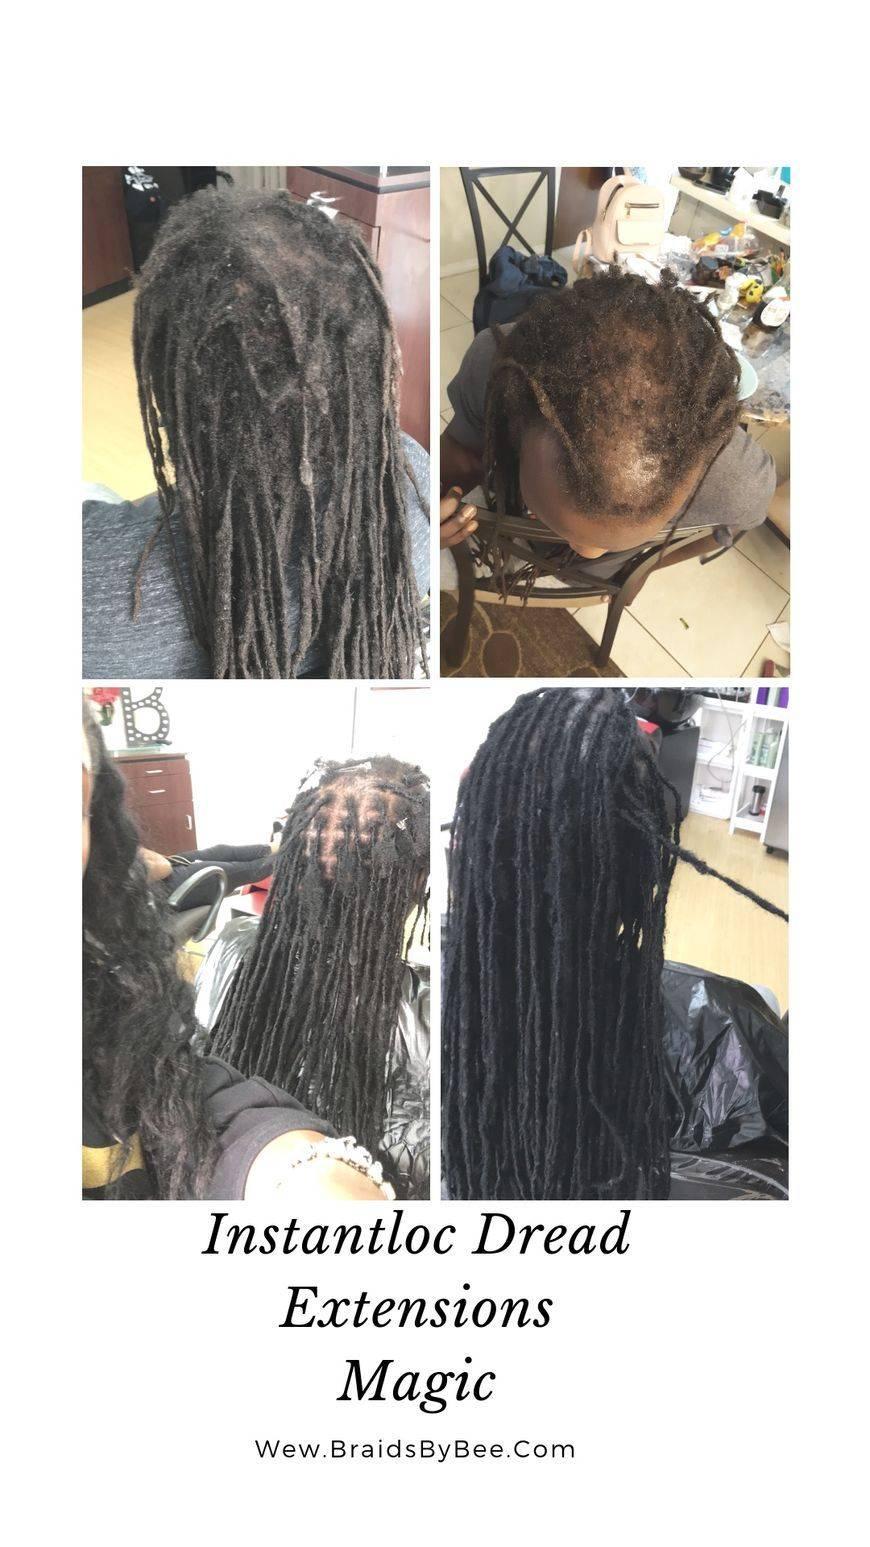 Instantloc Dread Extensions method used to repair his dreadlocks and perform hair transplant